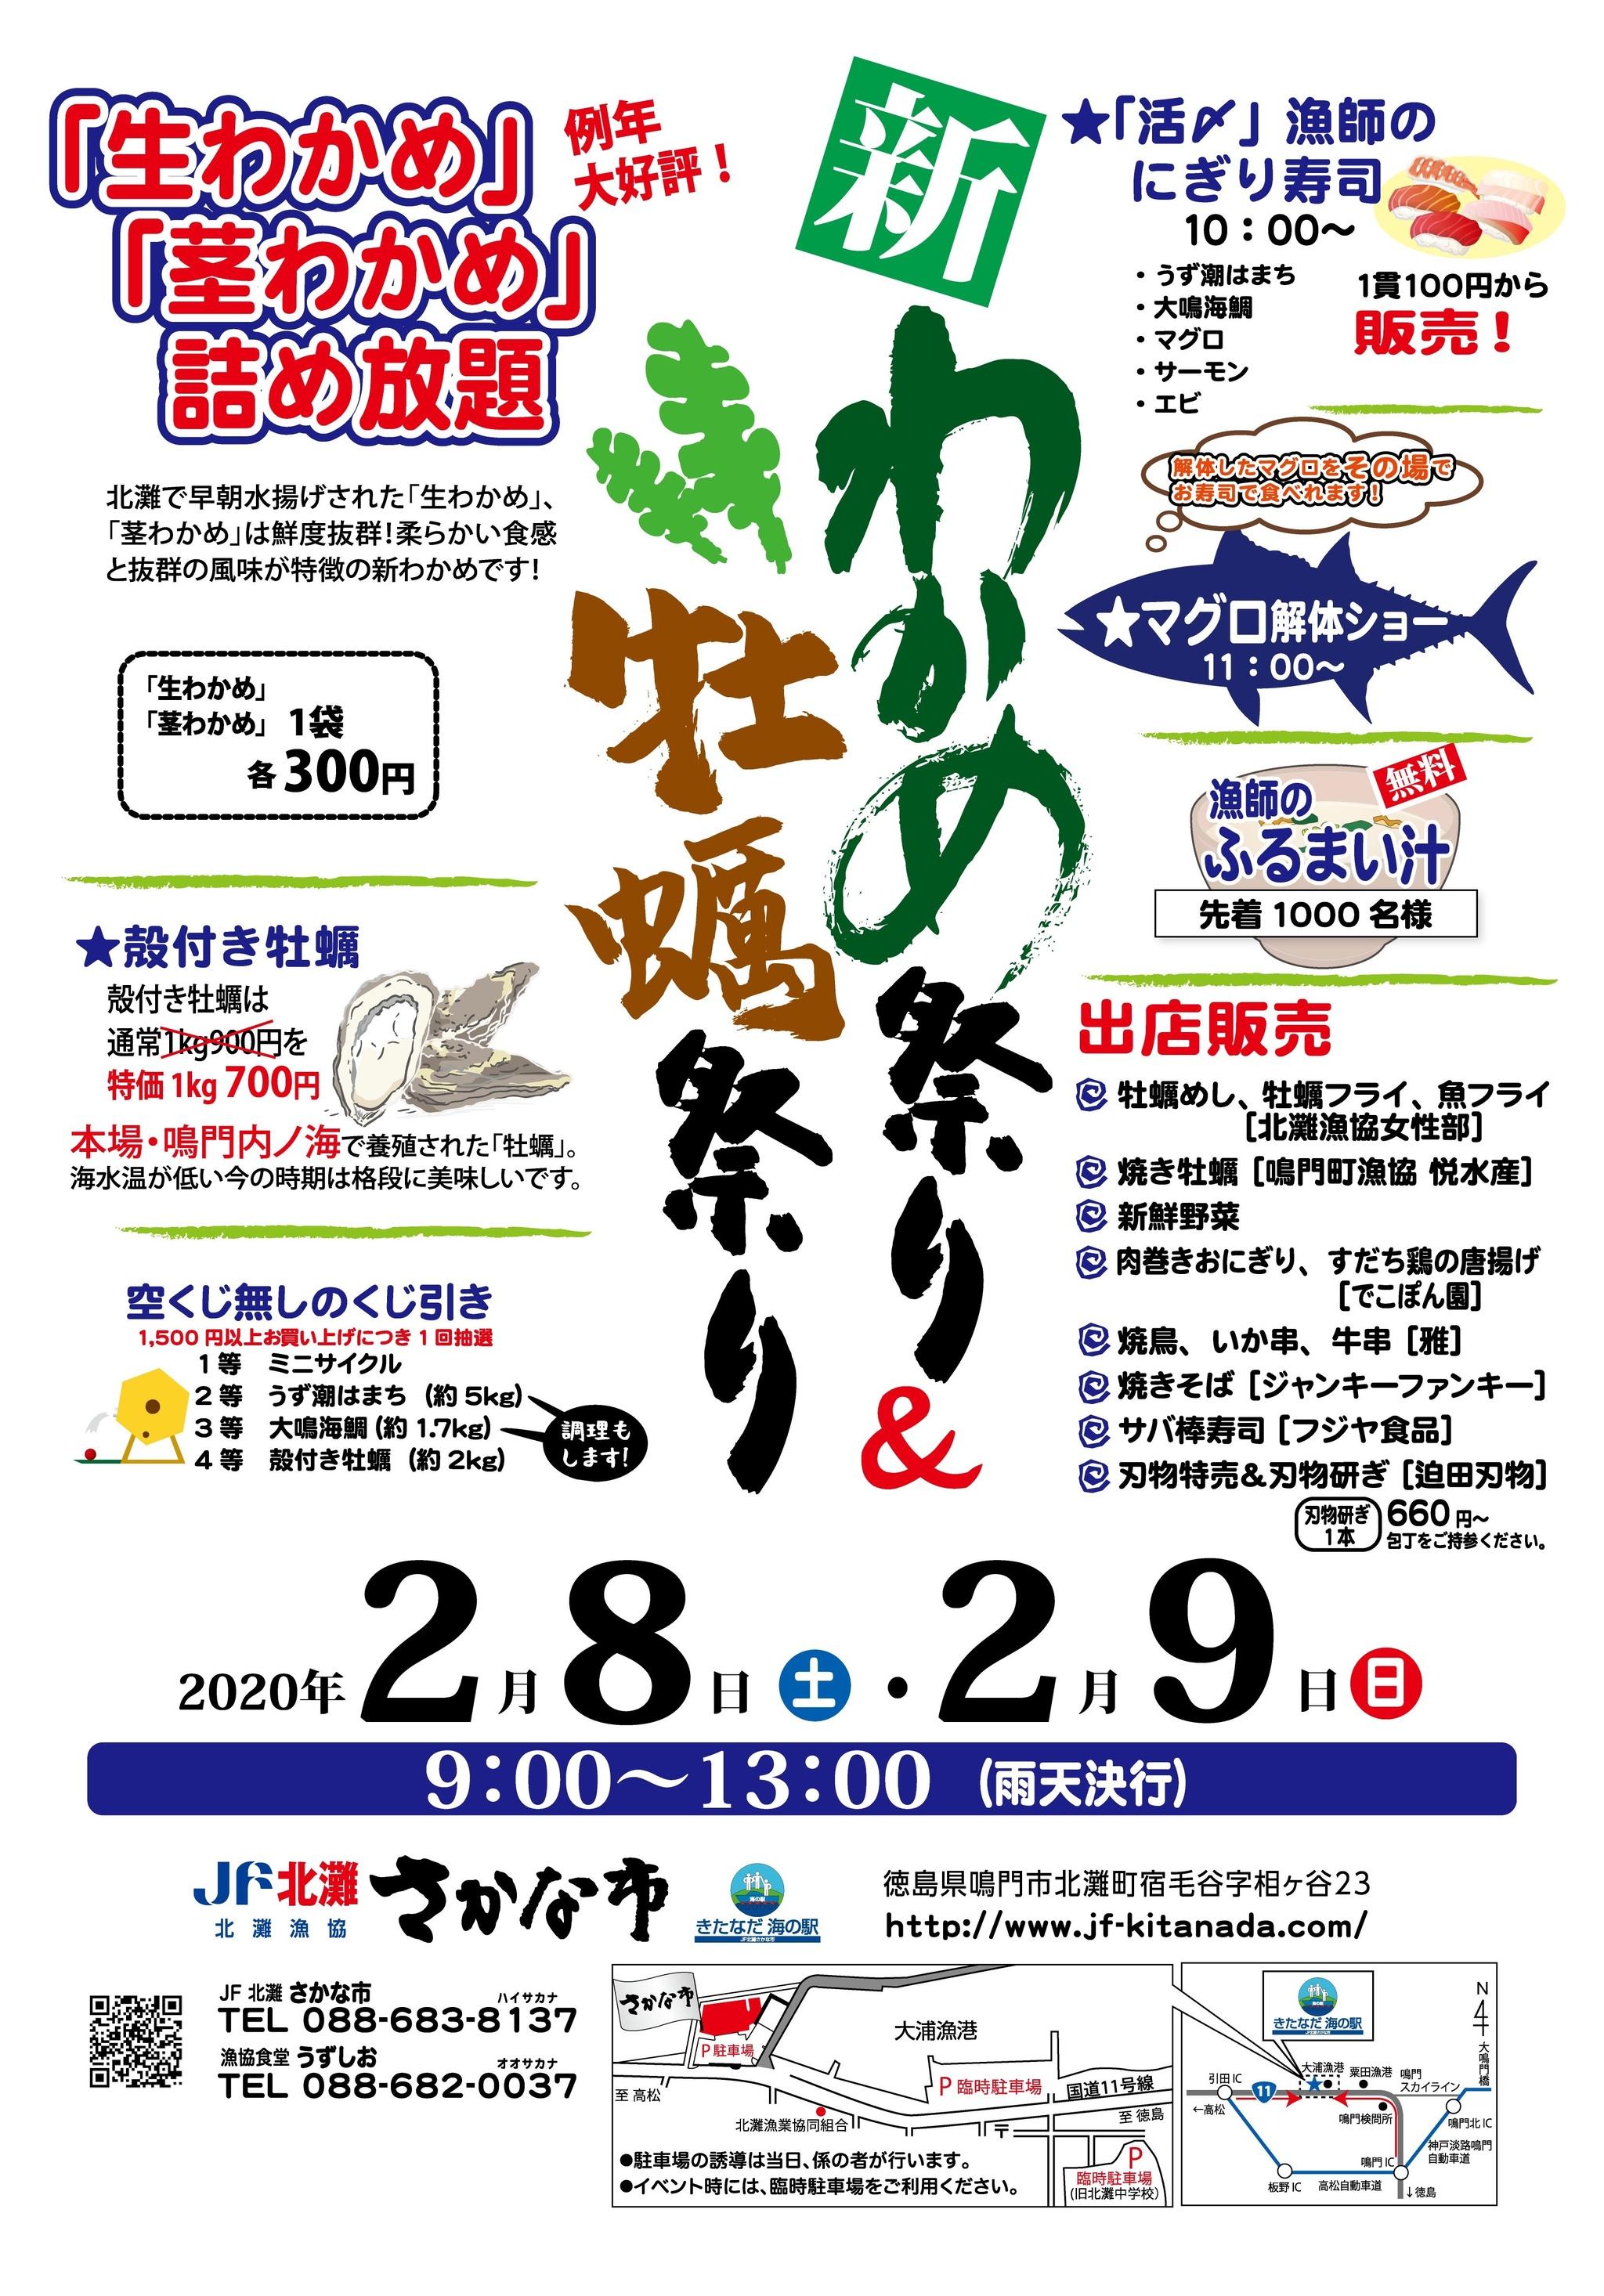 祭り 赤穂 2020 牡蠣